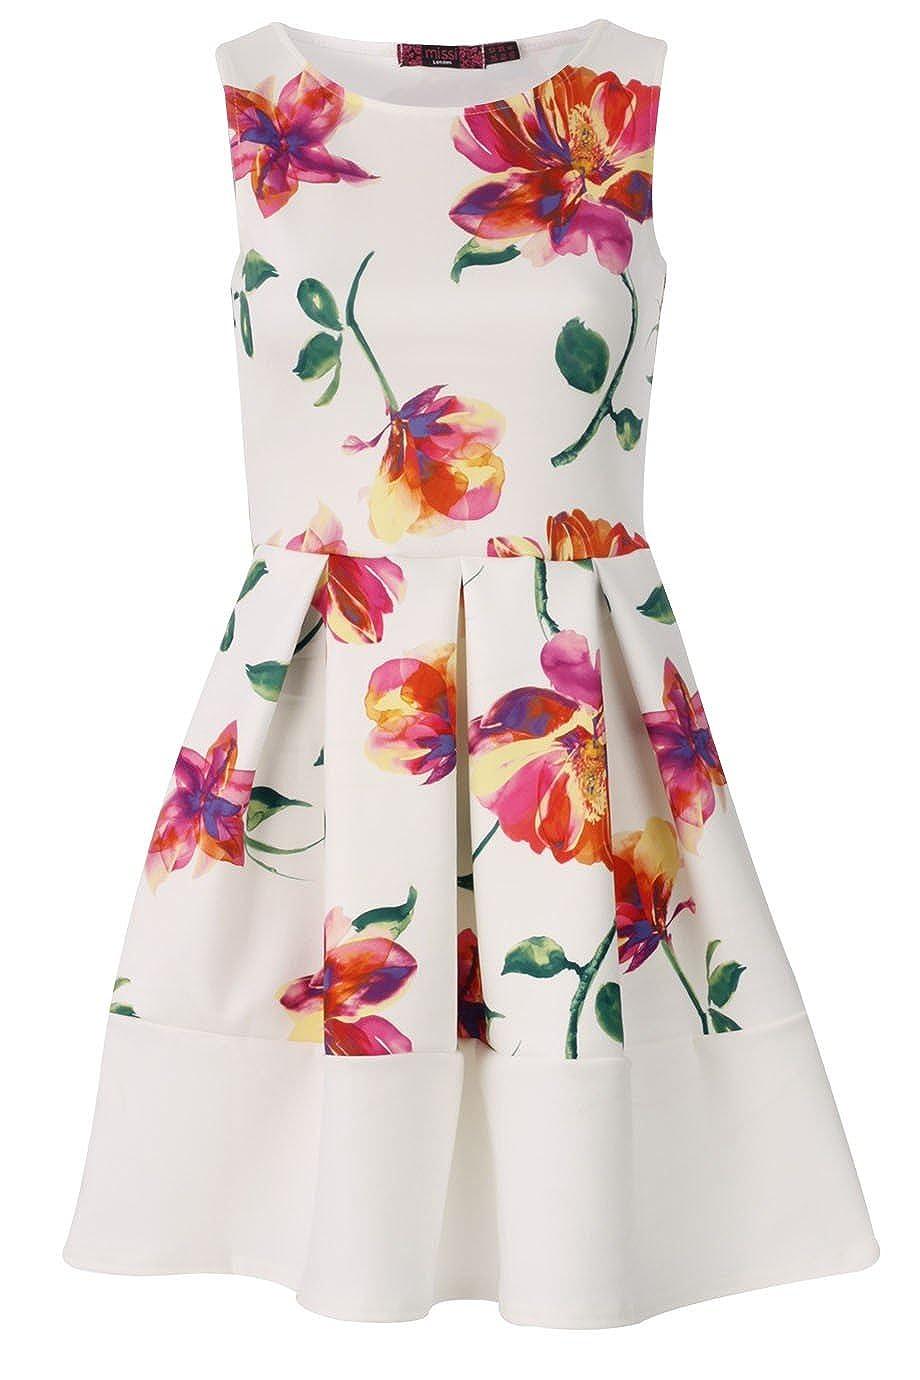 Ladies Girls Floral Panel Bow Black White Stripe Skater Dress Usa